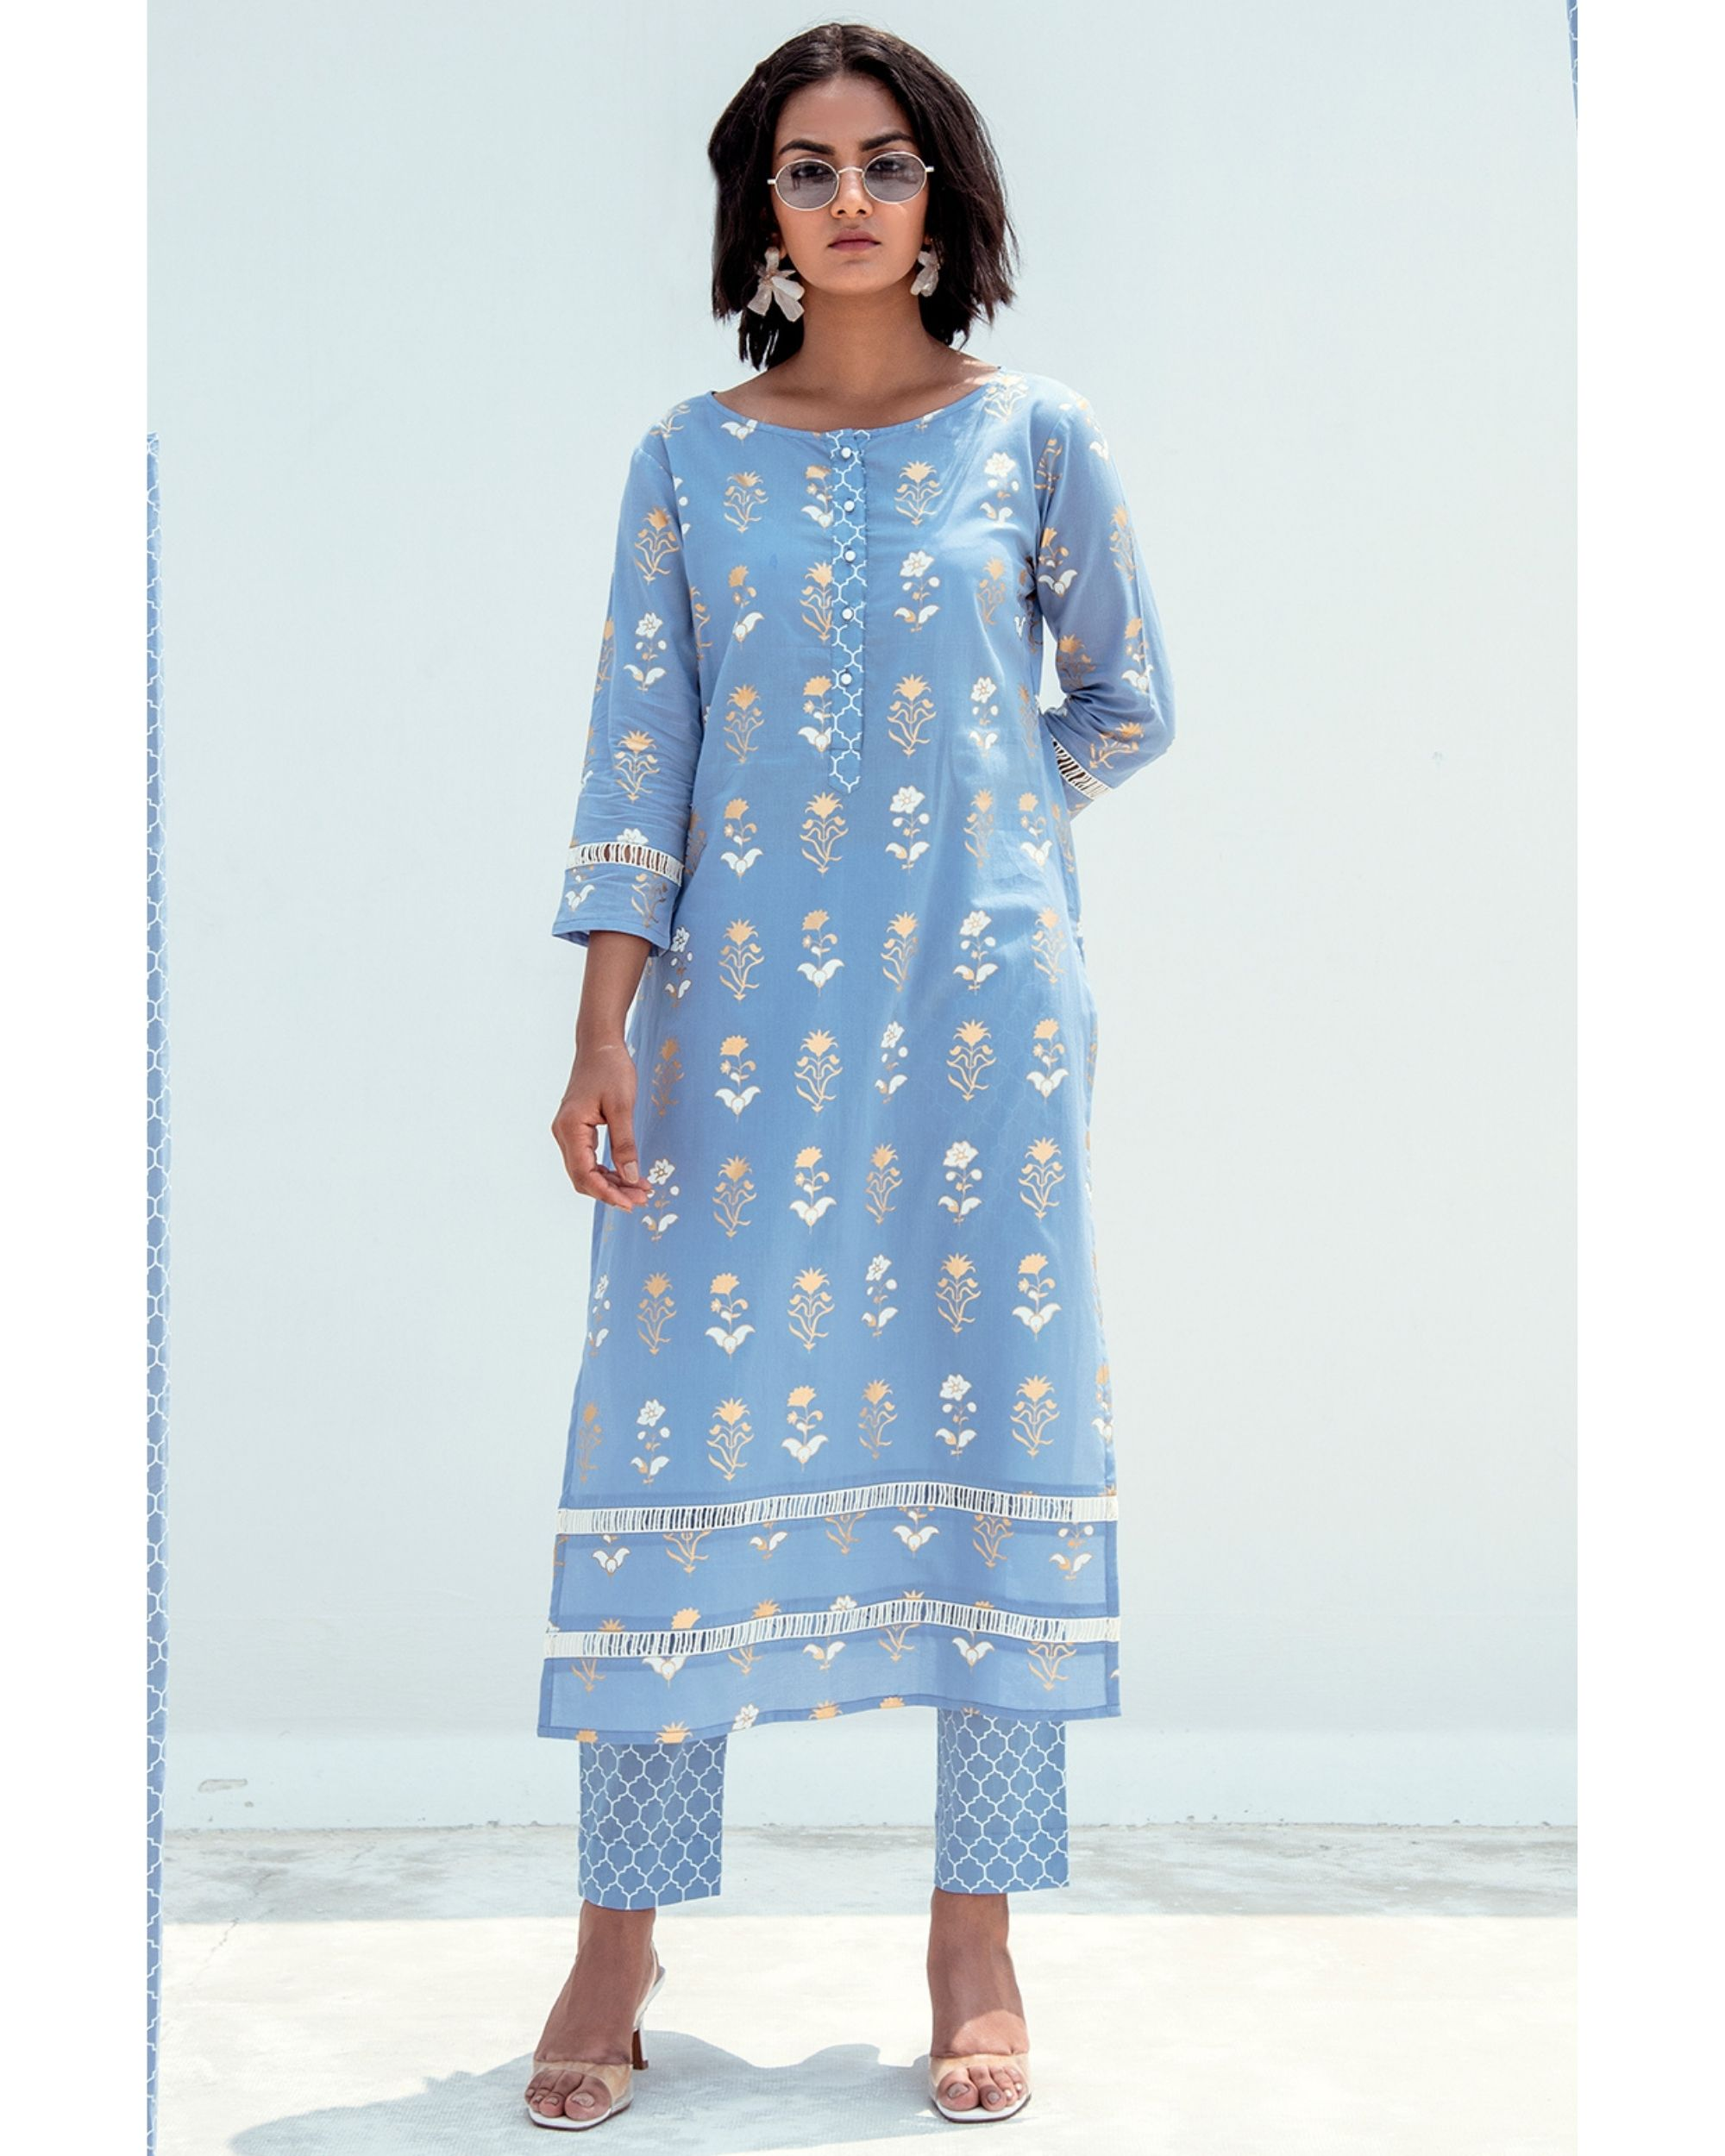 Blue and gold printed lace kurta